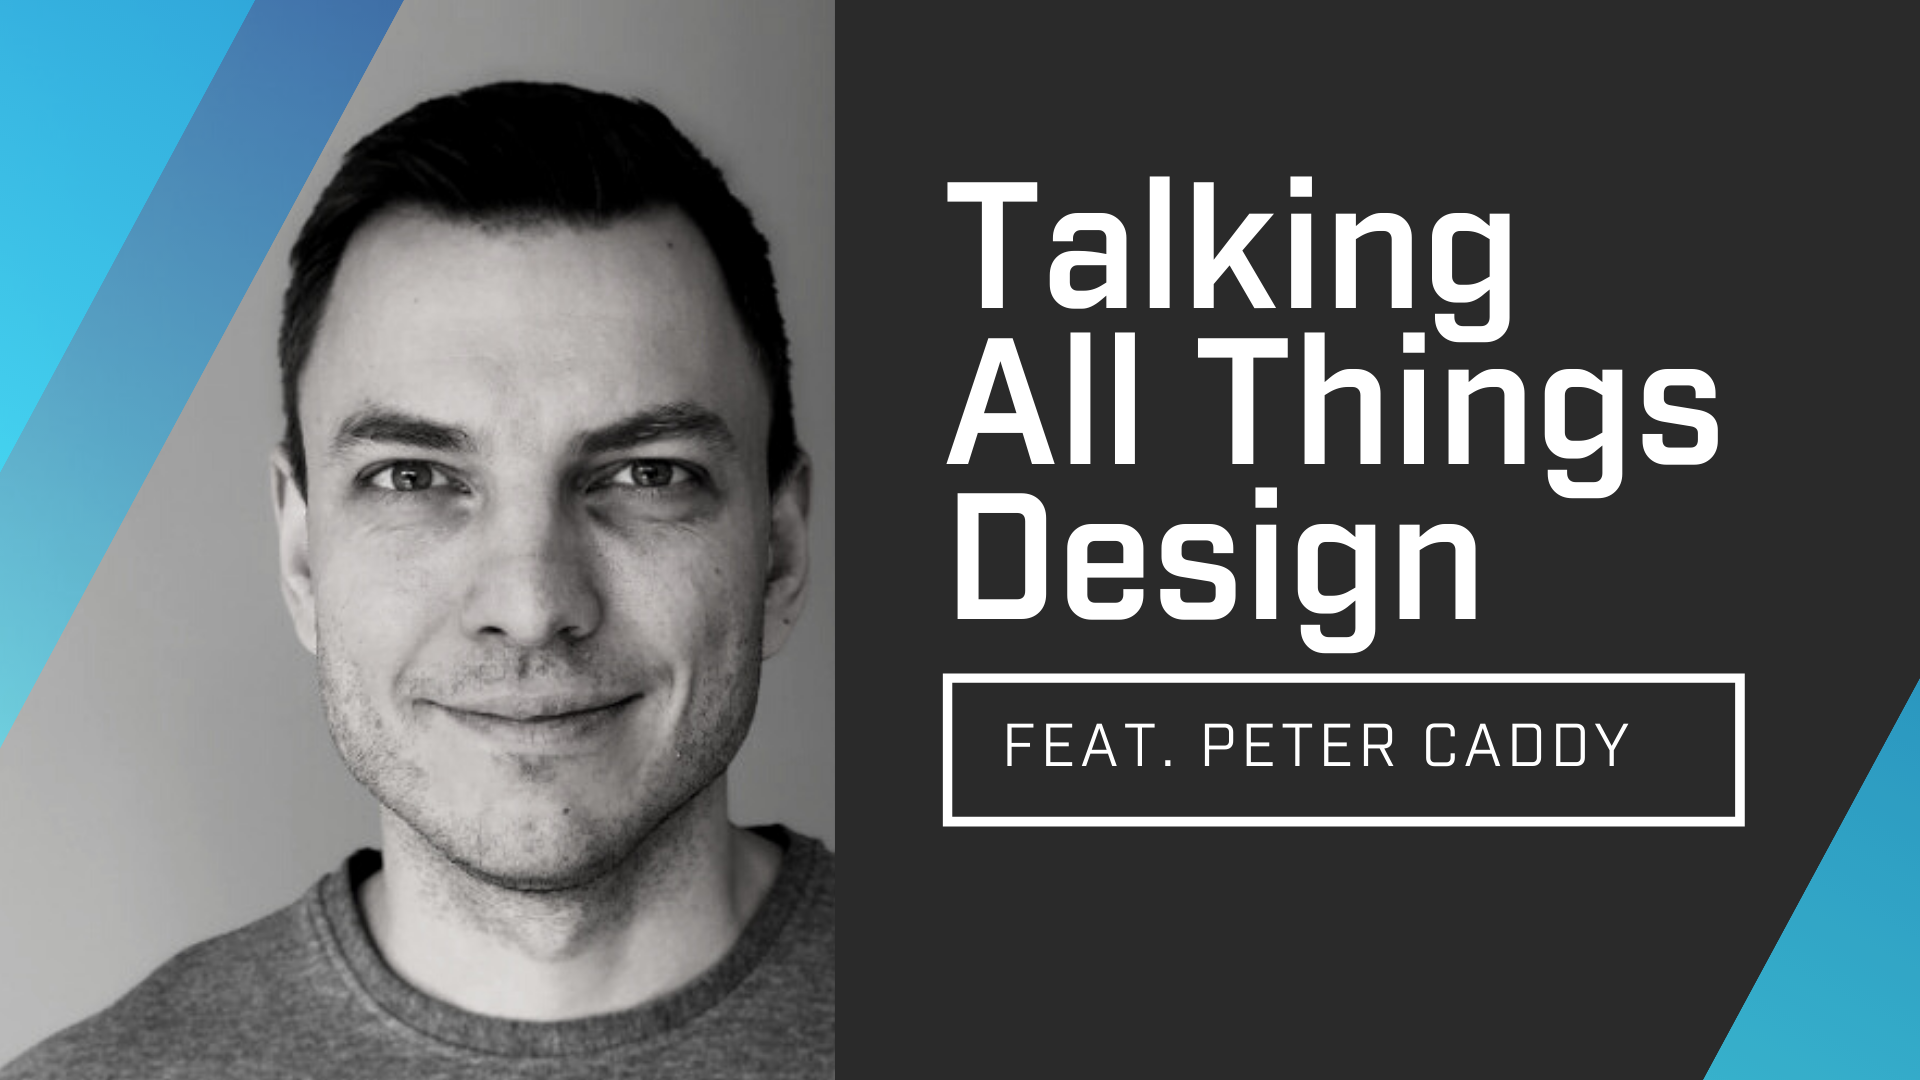 Talking All Things Design Blog Header image